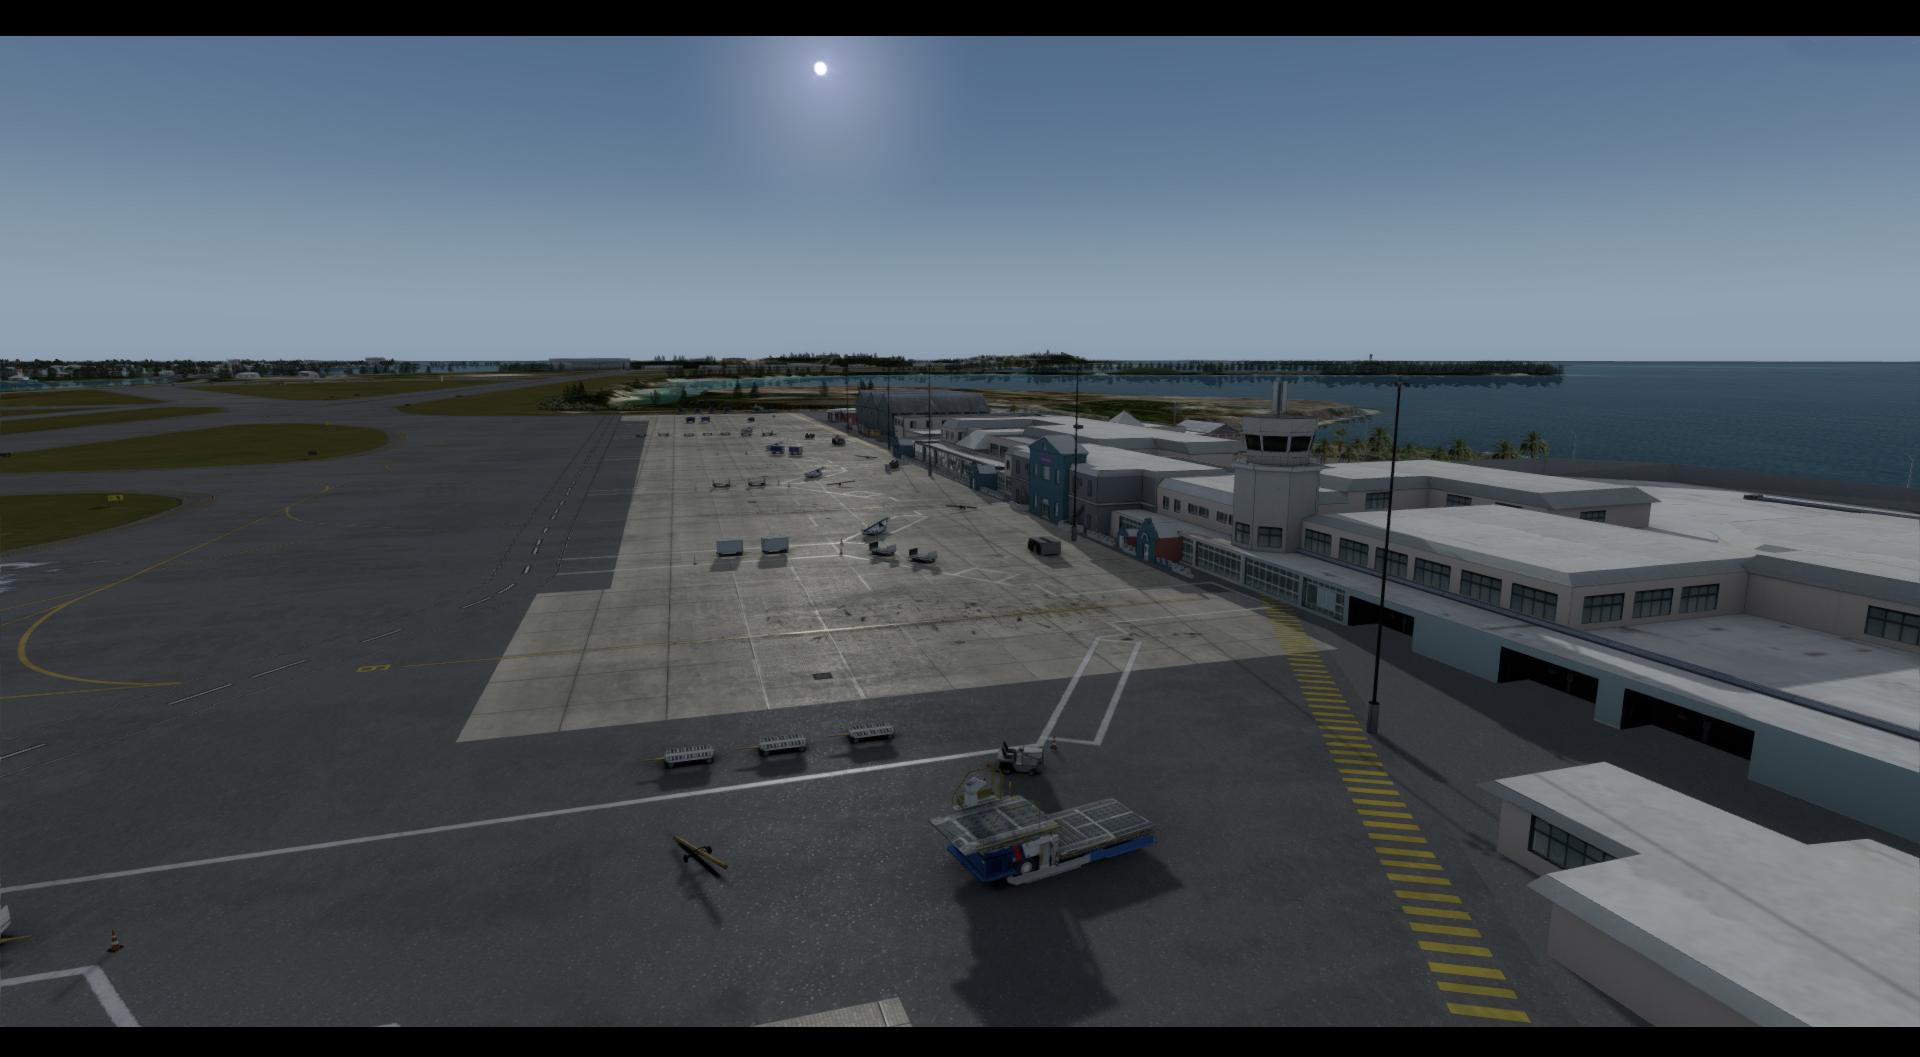 Bermuda TXKF Version 2 (P3Dv4 Only)